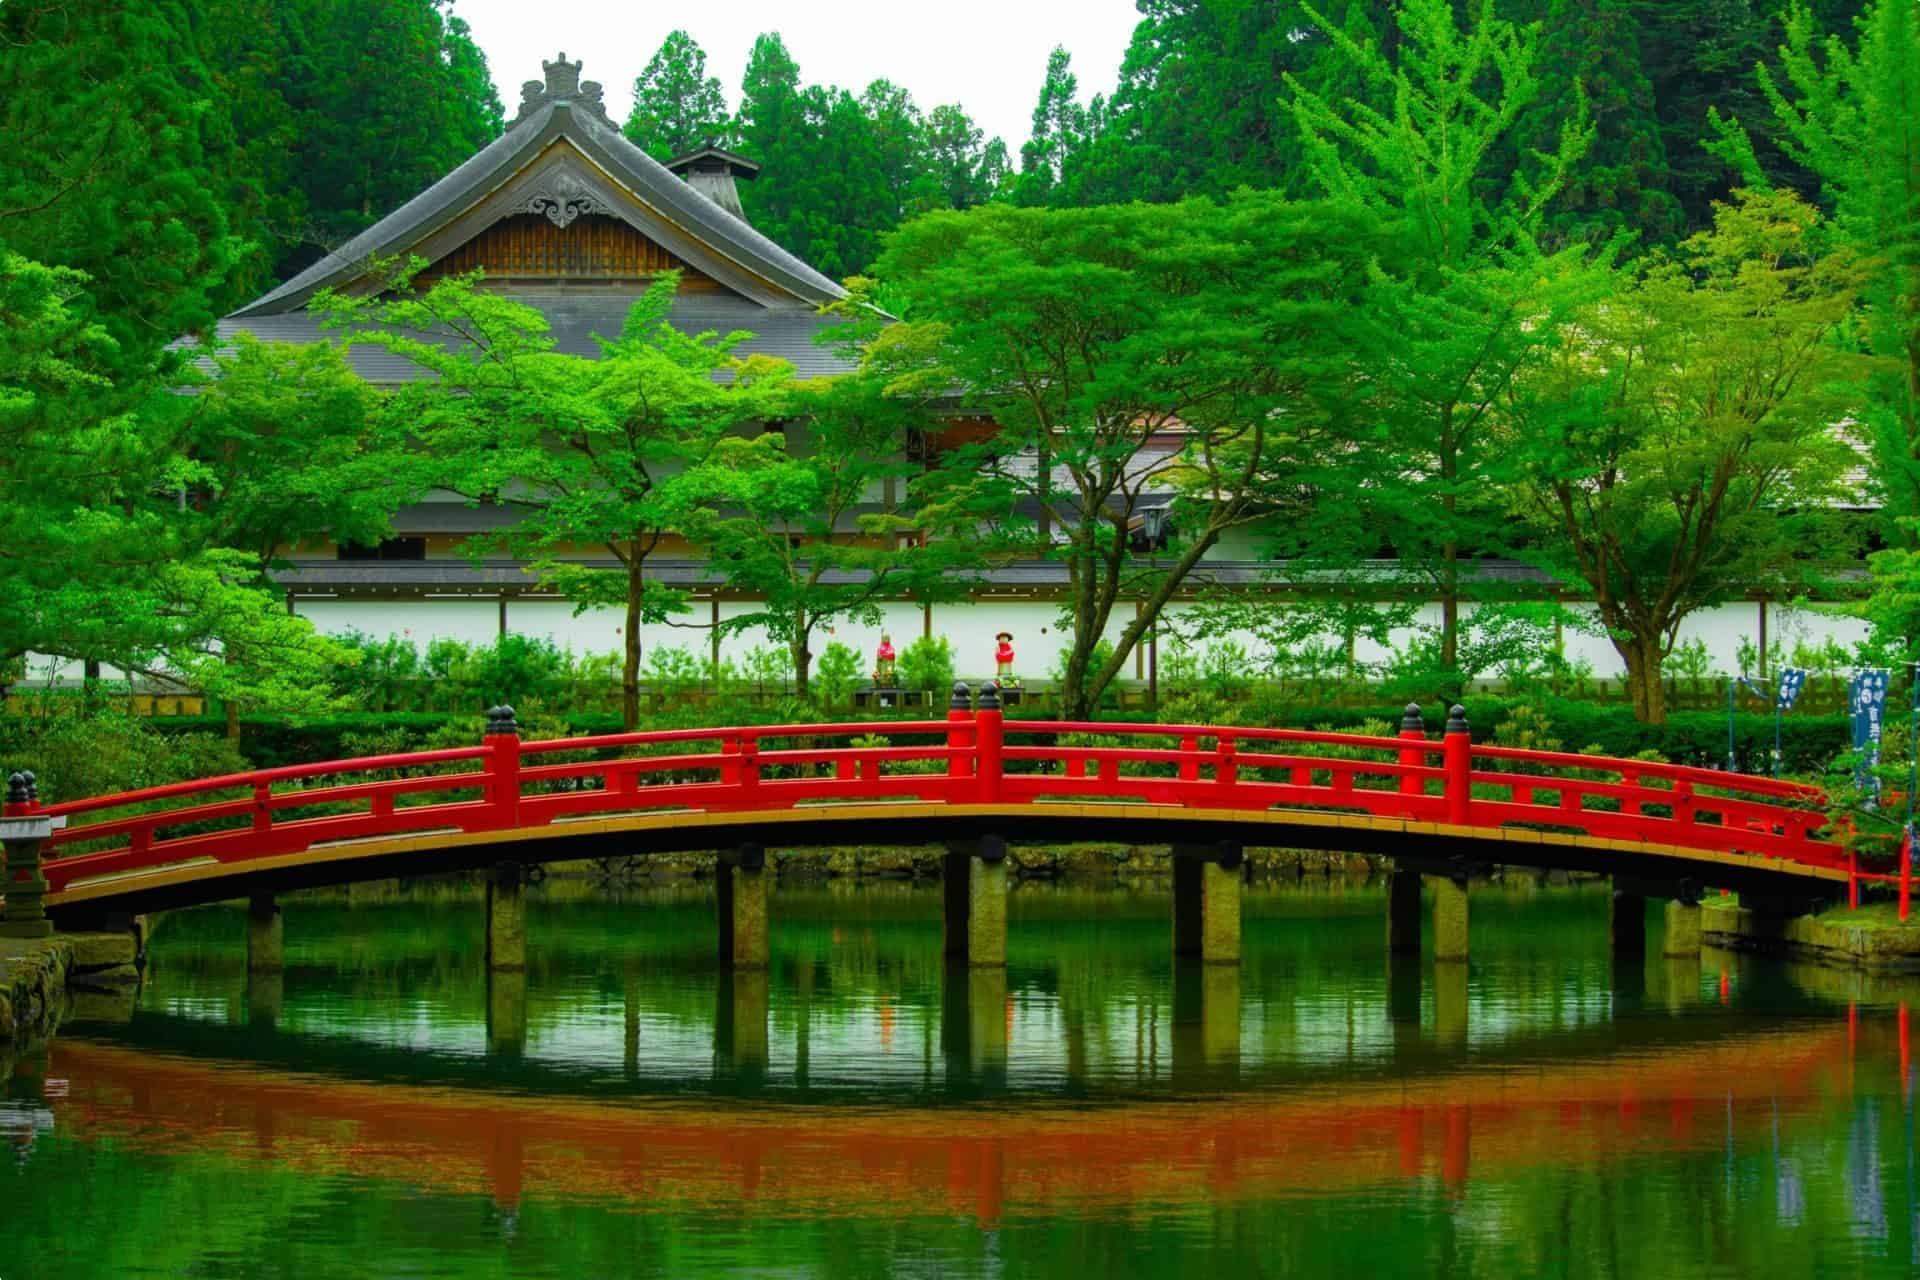 A bridge in Japan